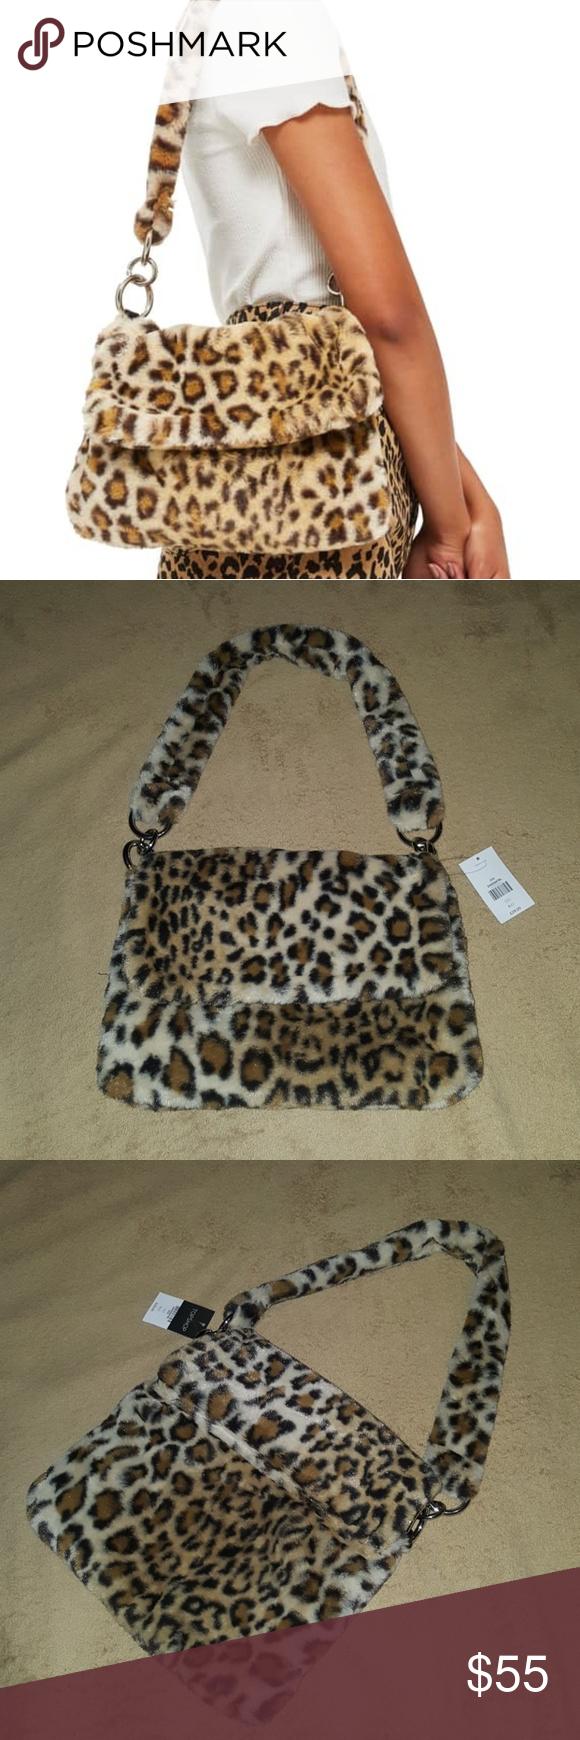 a59abc6408db Topshop Teddy Leopard Print Shoulder Bag NWT!! A fuzzy faux-fur strap and